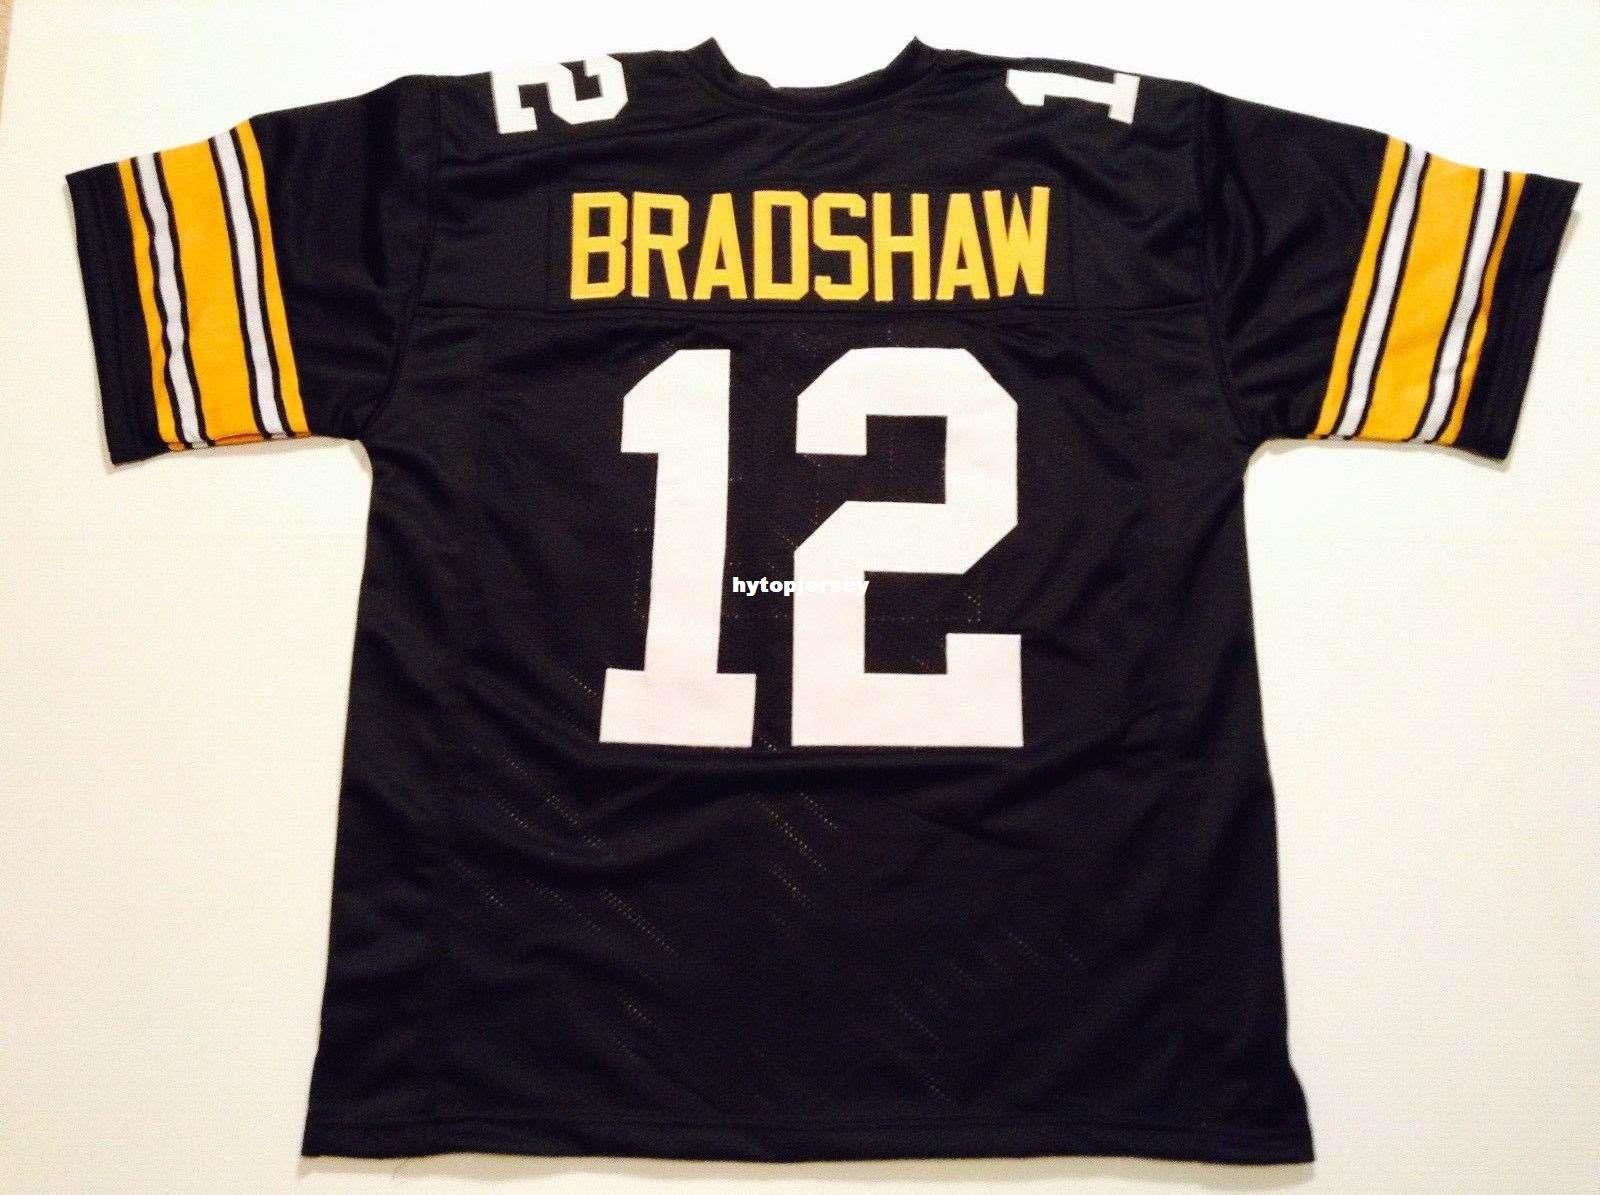 09a5bf653dd Cheap Retro custom Sewn Stitched #12 Terry Bradshaw Black MITCHELL & NESS  Jersey Men's Football Jerseys College NCAA